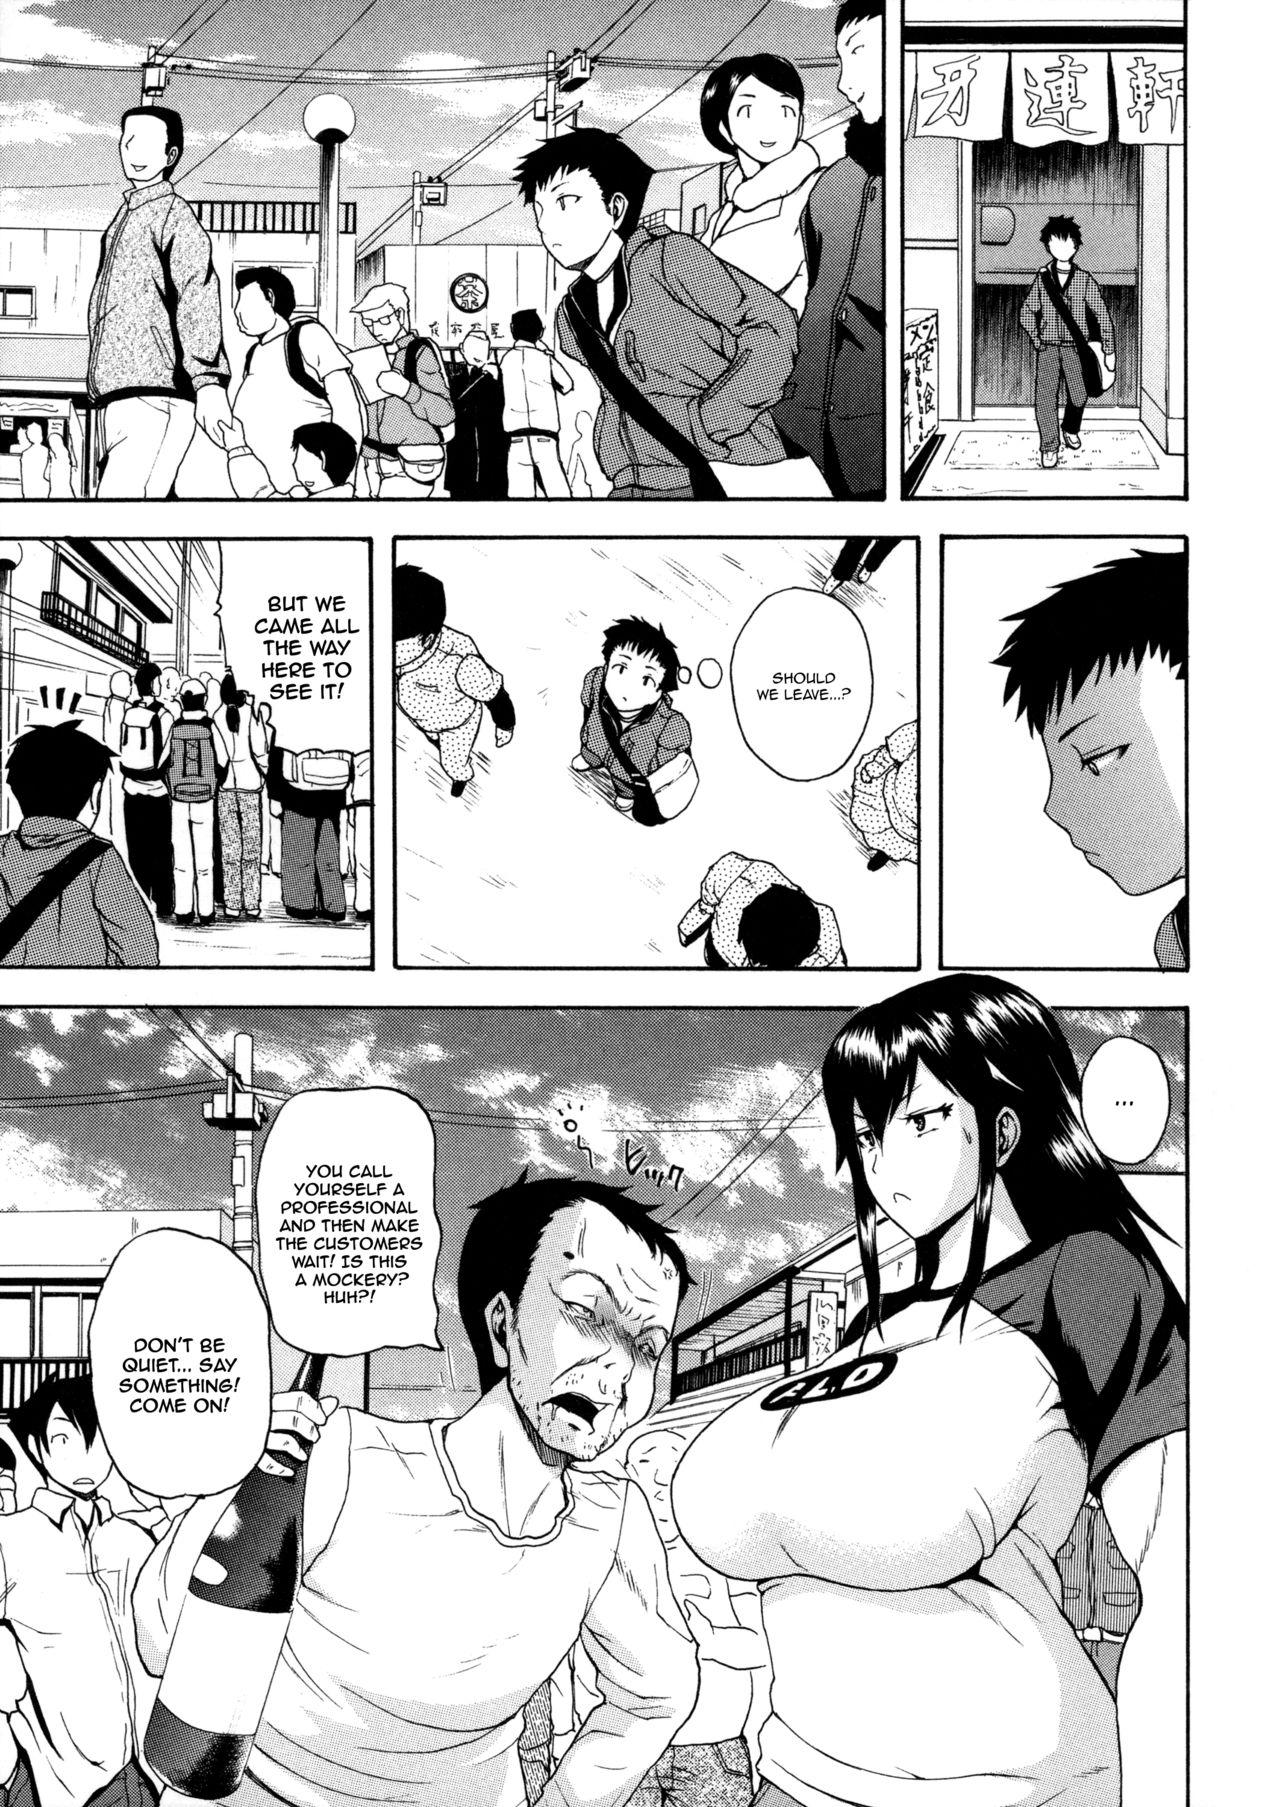 [Yoshimura Tatsumaki] Monzetsu Taigatame ~Count 3 de Ikasete Ageru~ | Faint in Agony Bodylock ~I'll make you cum on the count of 3~ [English] [Brolen] 151